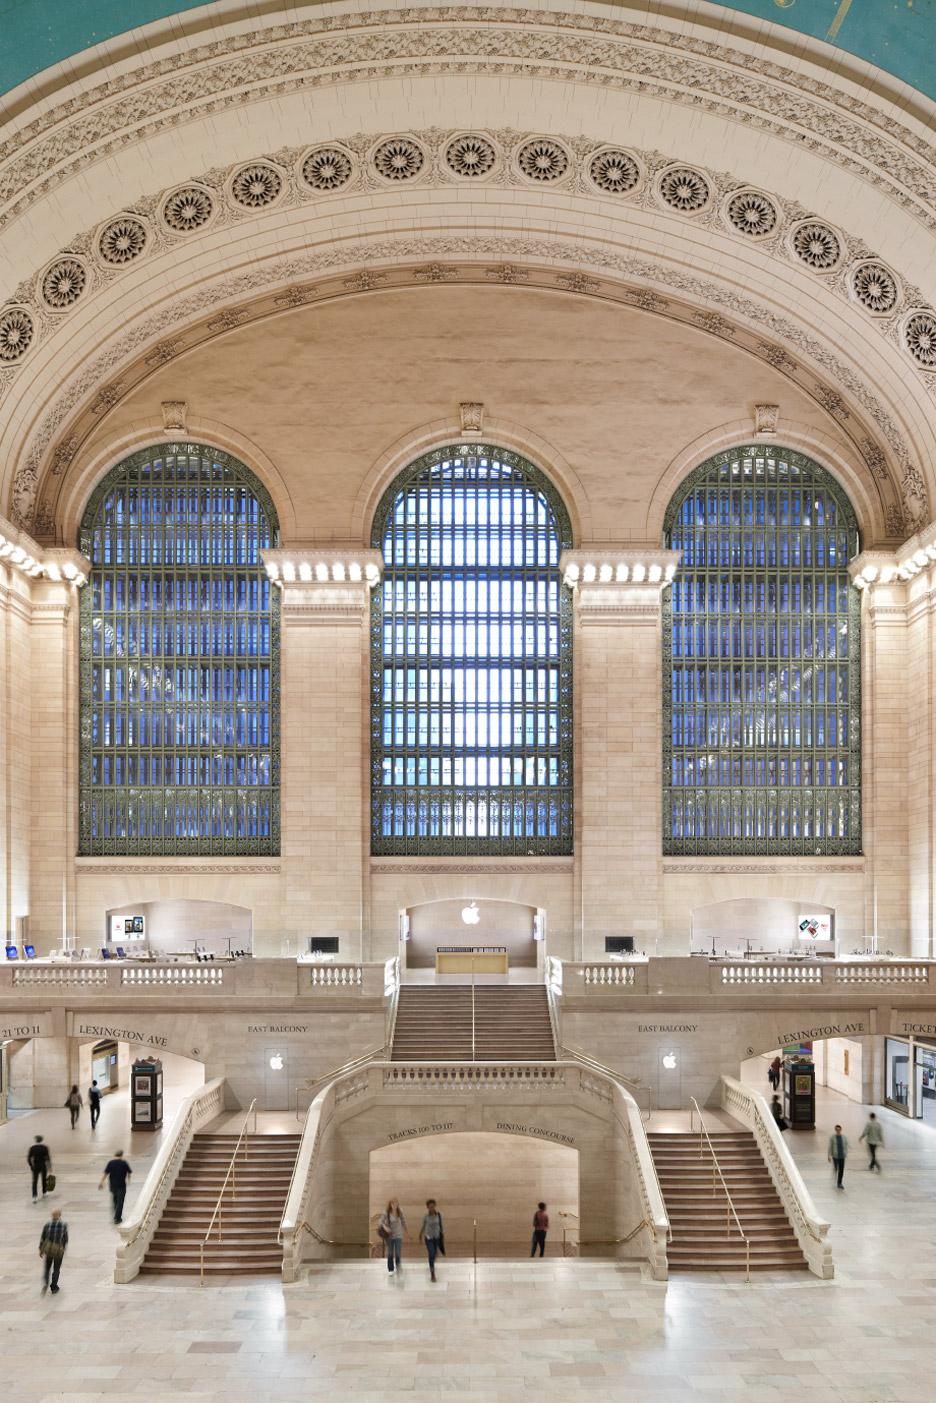 Apple given New York preservation award for repurposing historic buildings